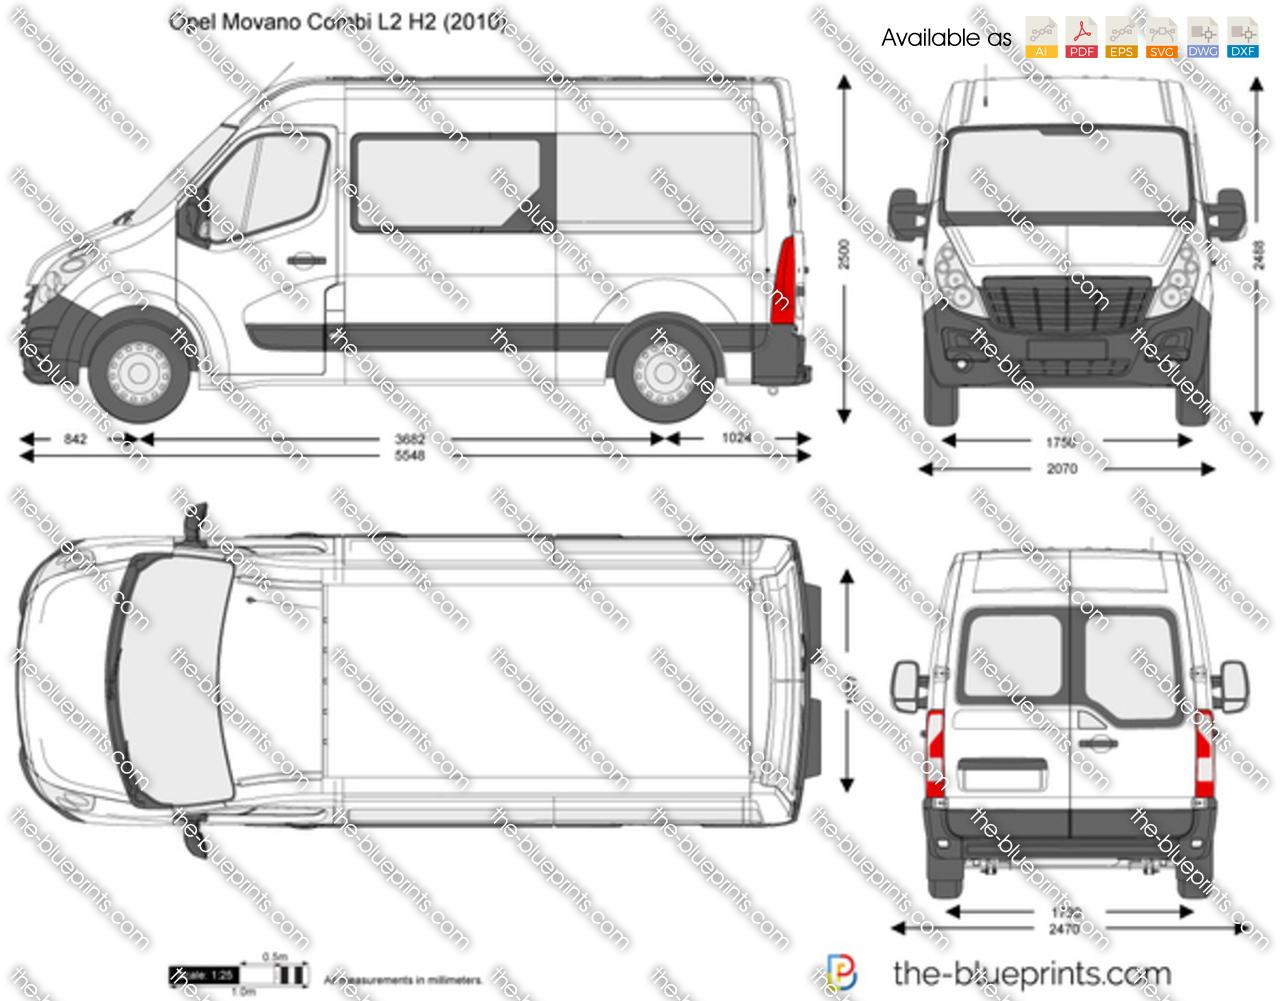 Opel Movano Combi L2 H2 Vector Drawing